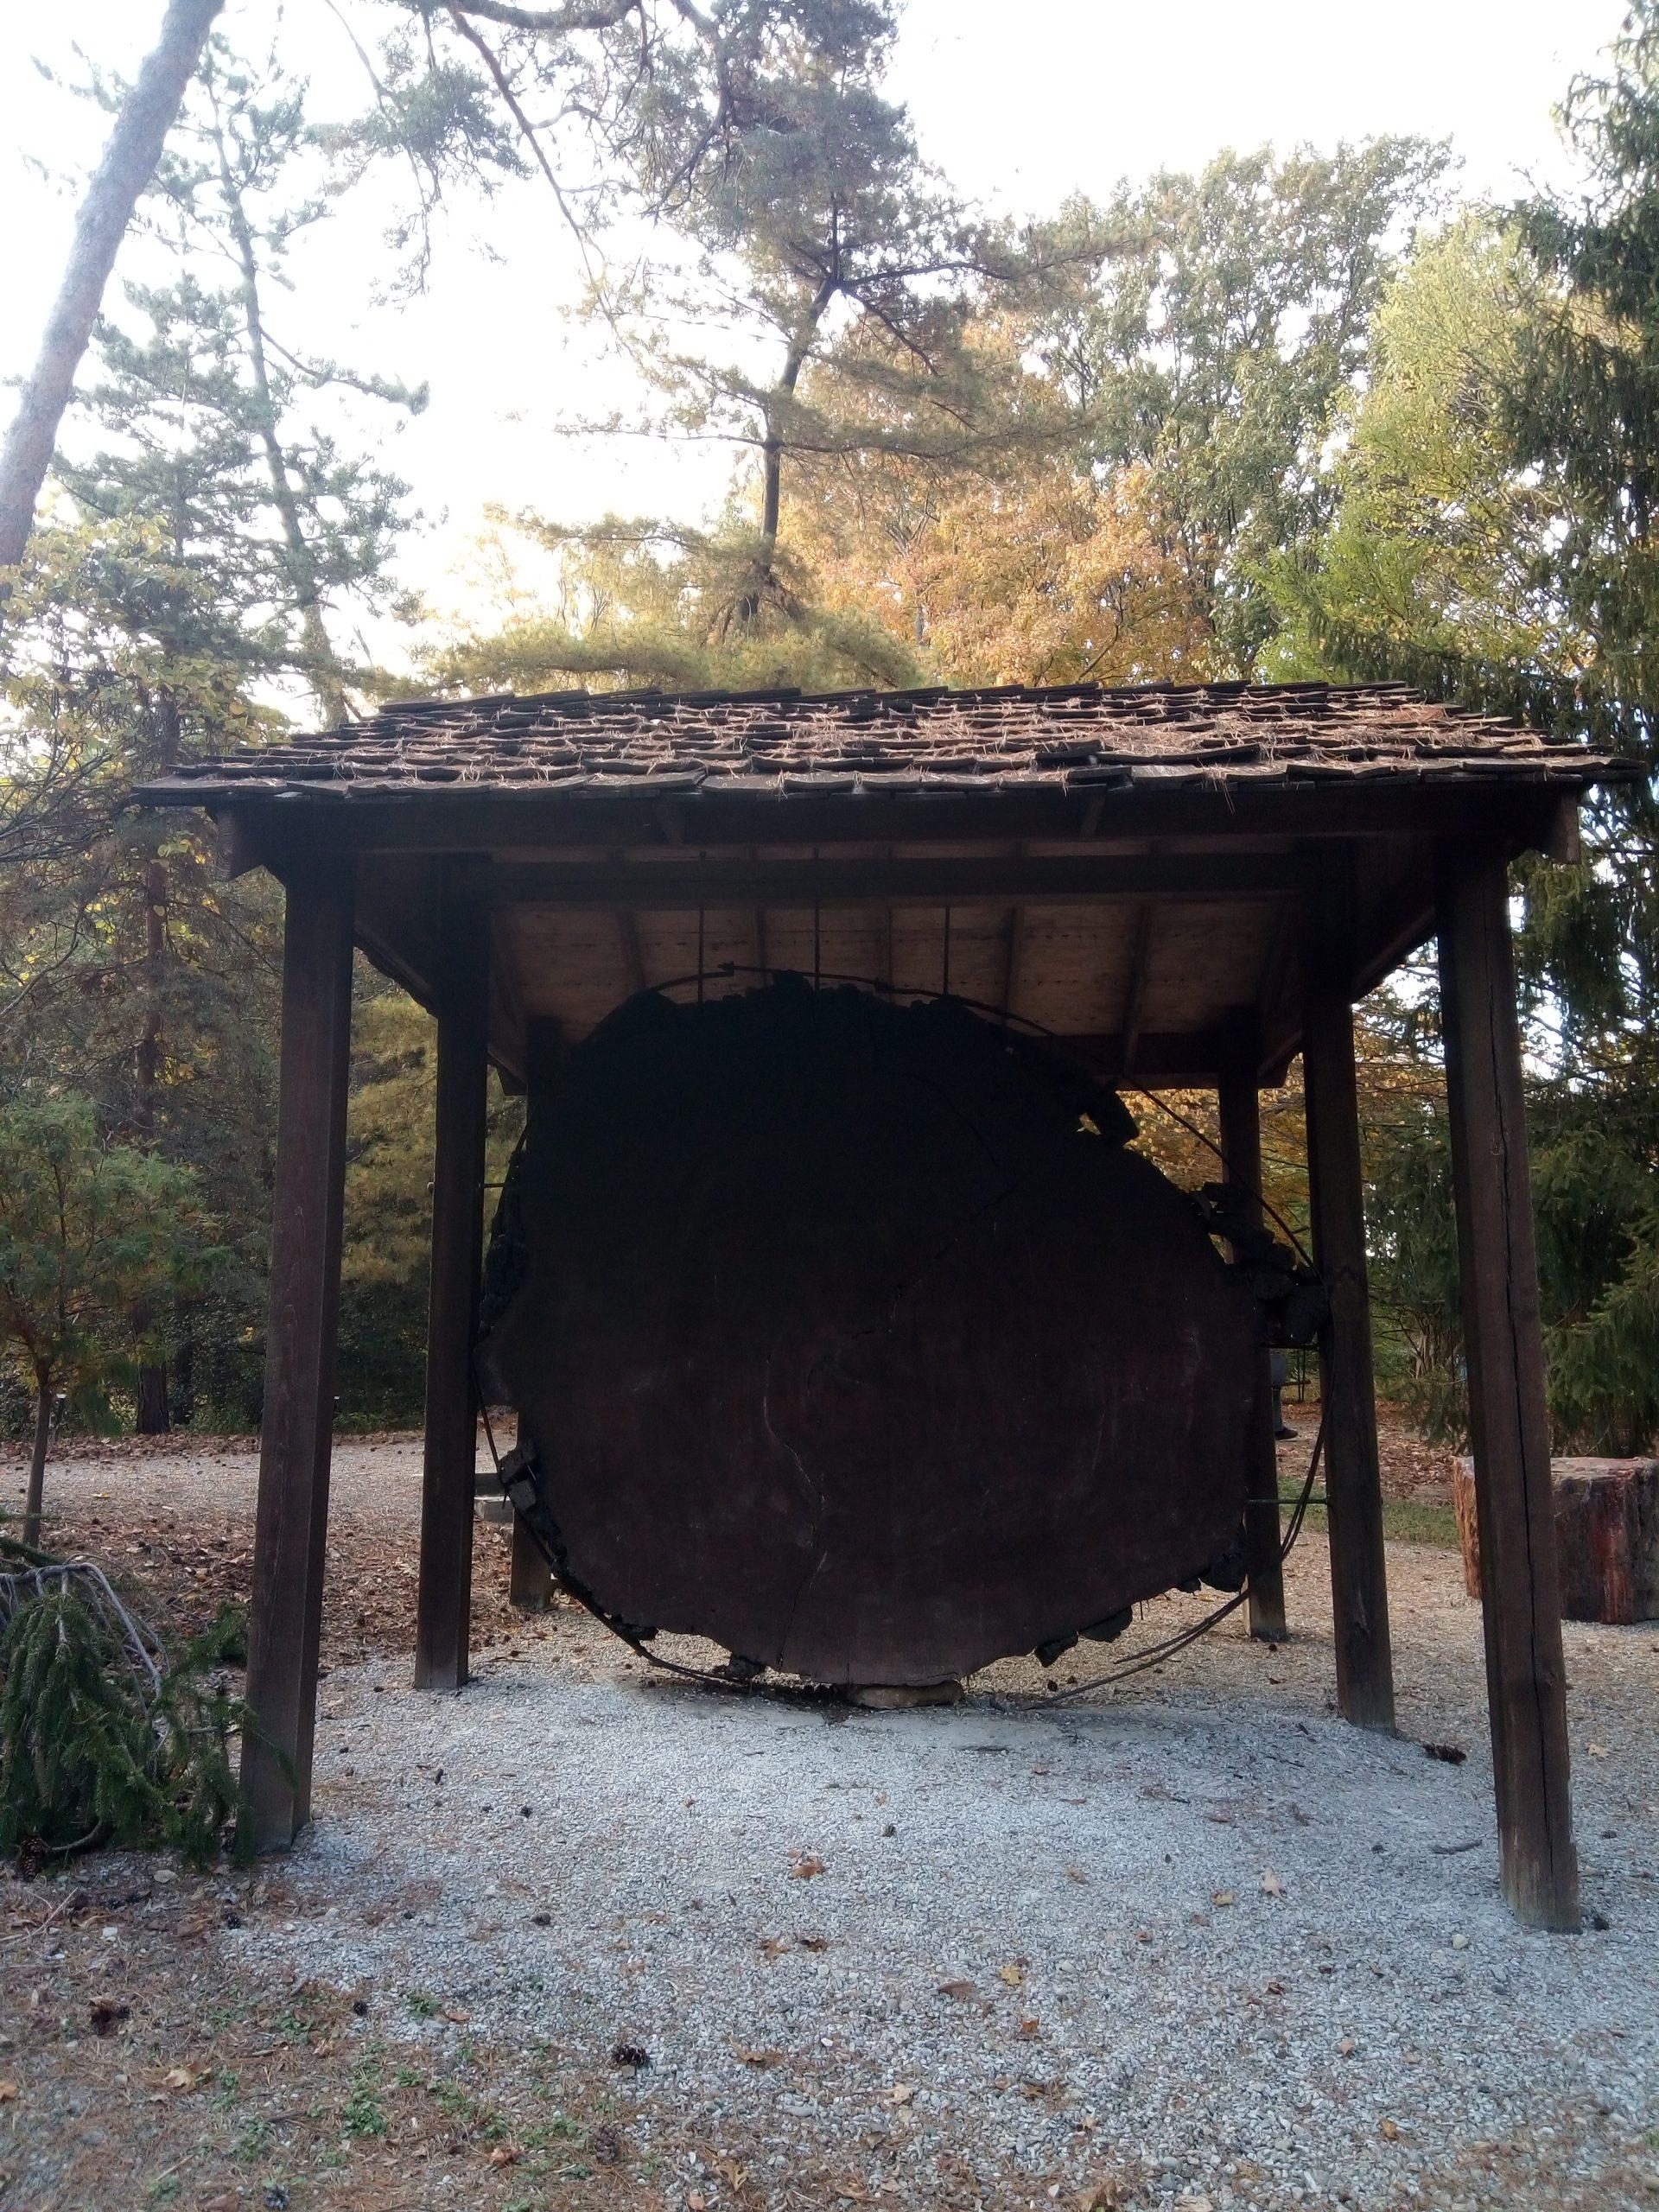 Stanley Rowe Arboretum massive tree stump